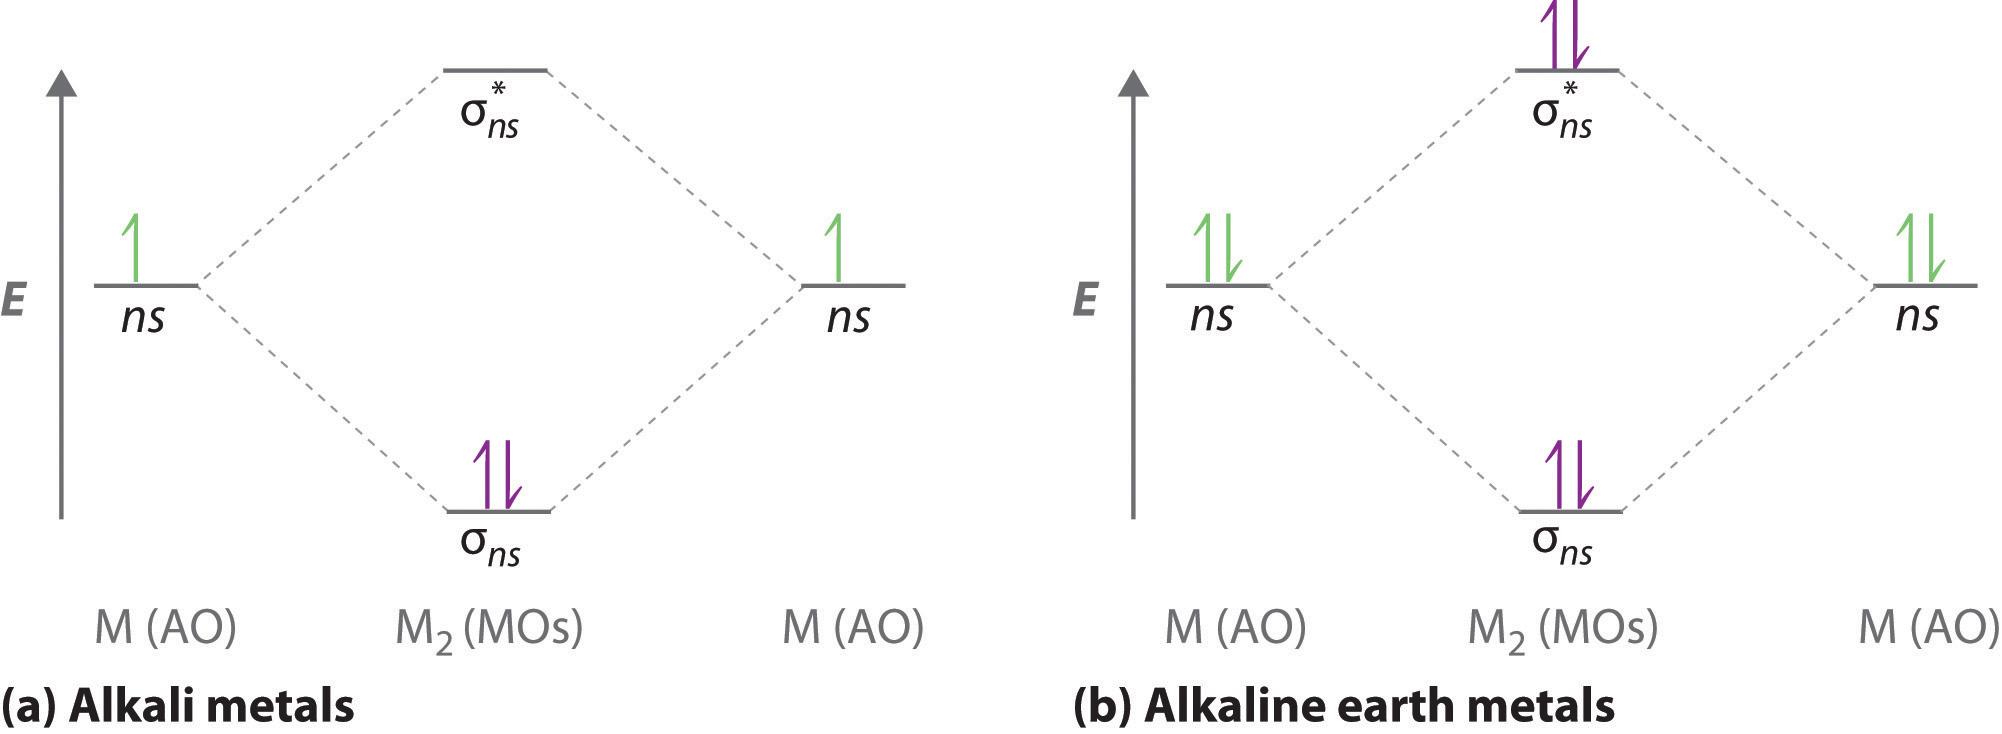 molecular orbital diagram for h2 home circuit wiring diagrams delocalized bonding and orbitals